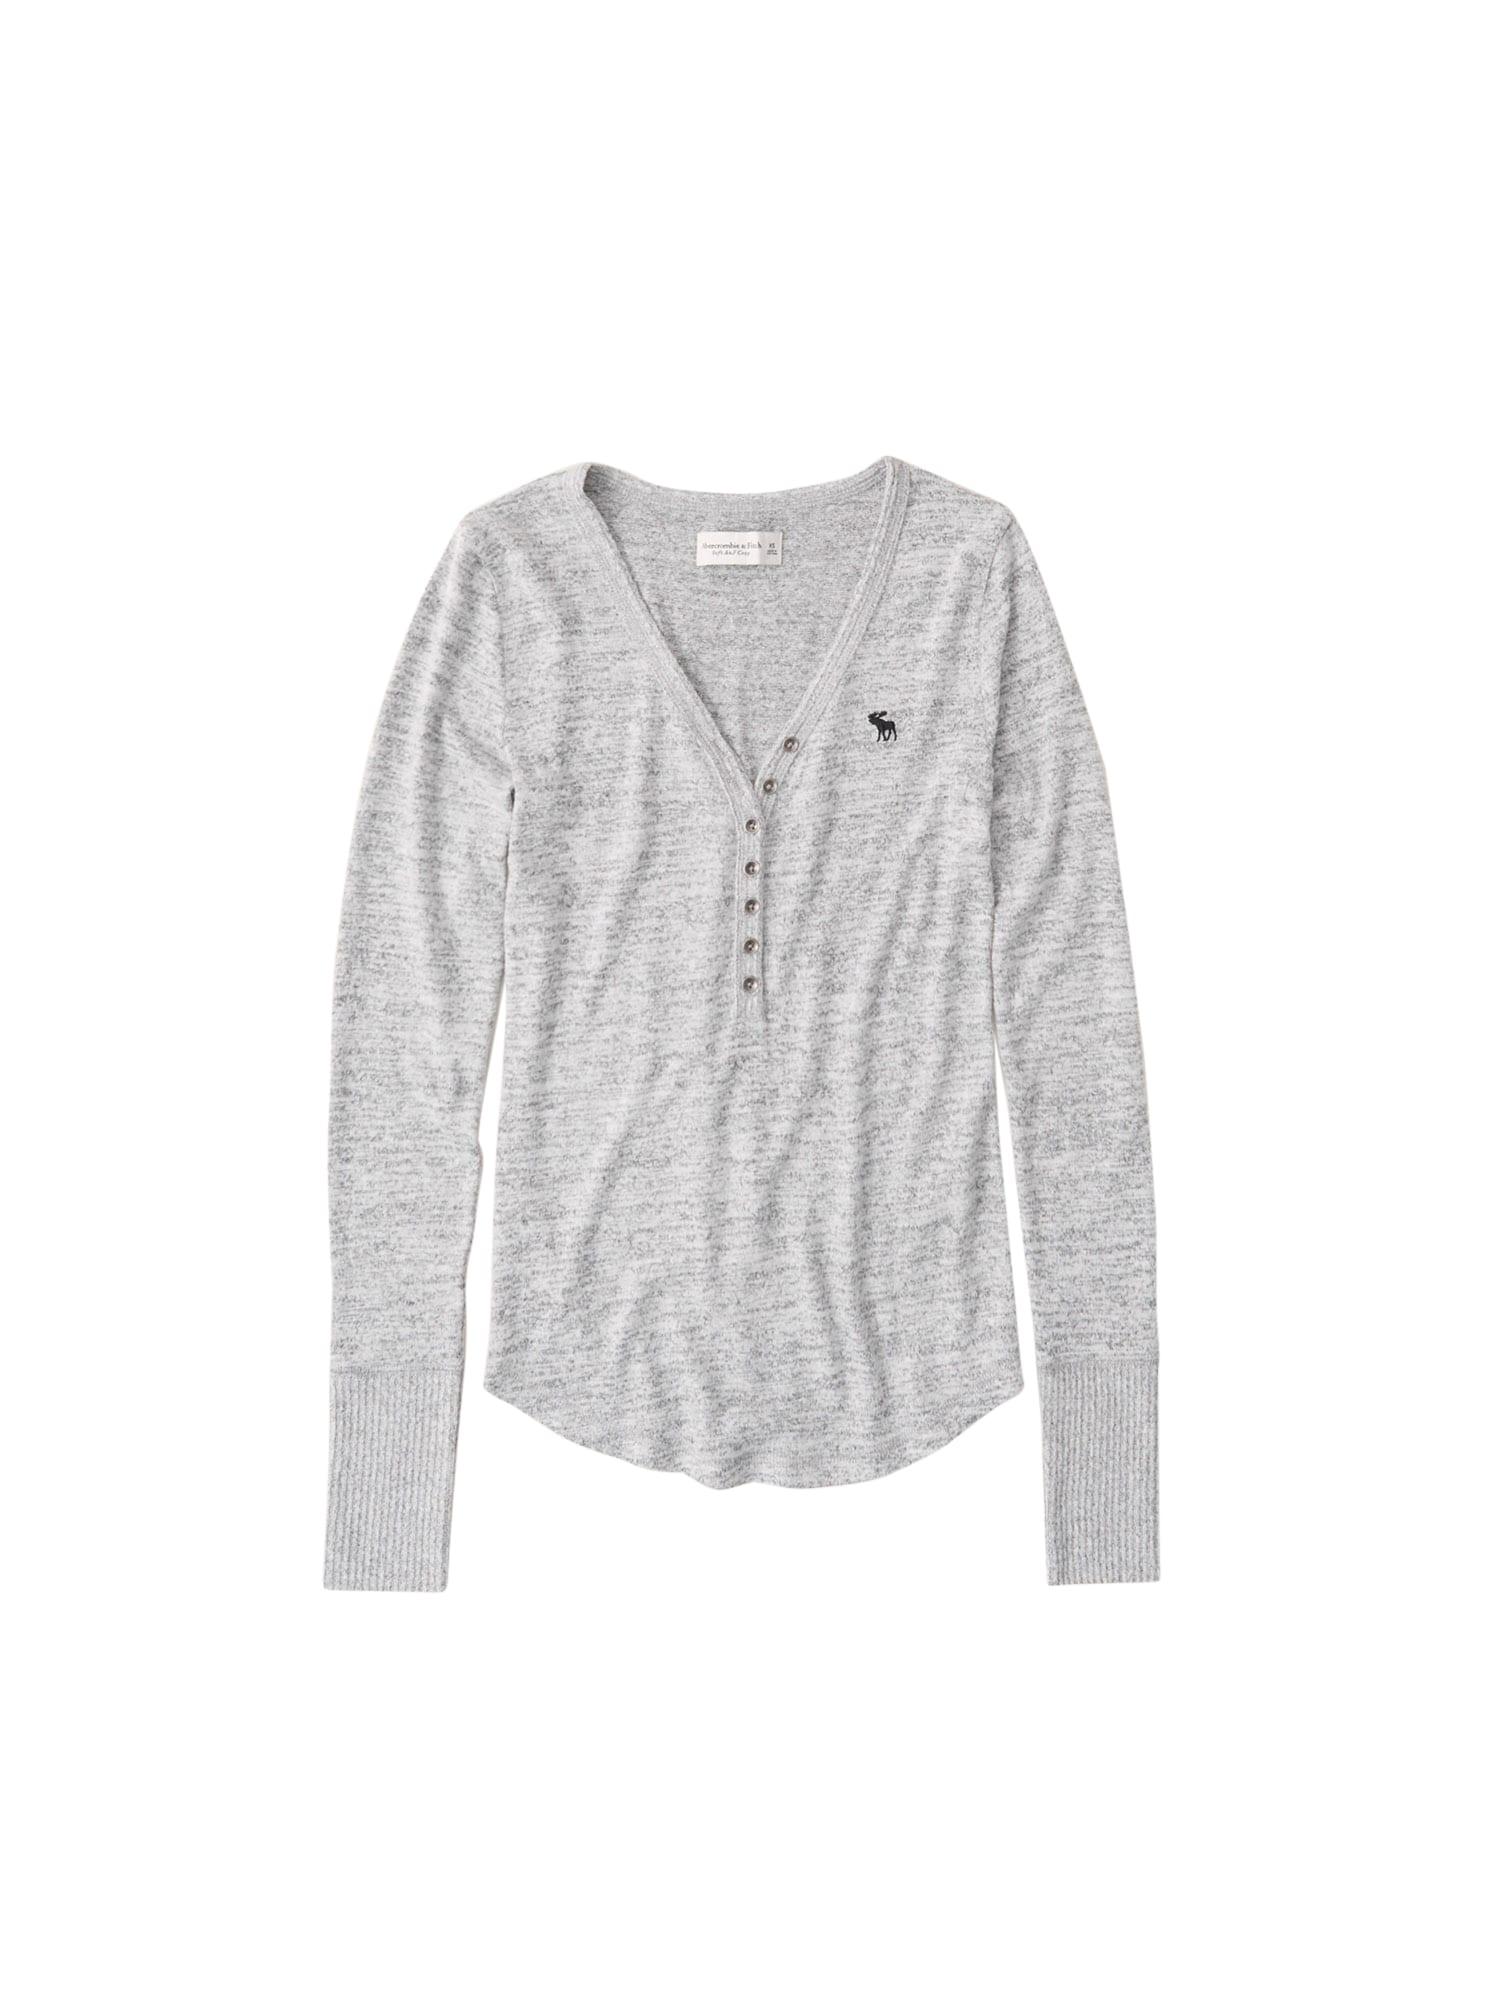 Abercrombie & Fitch Marškinėliai margai pilka